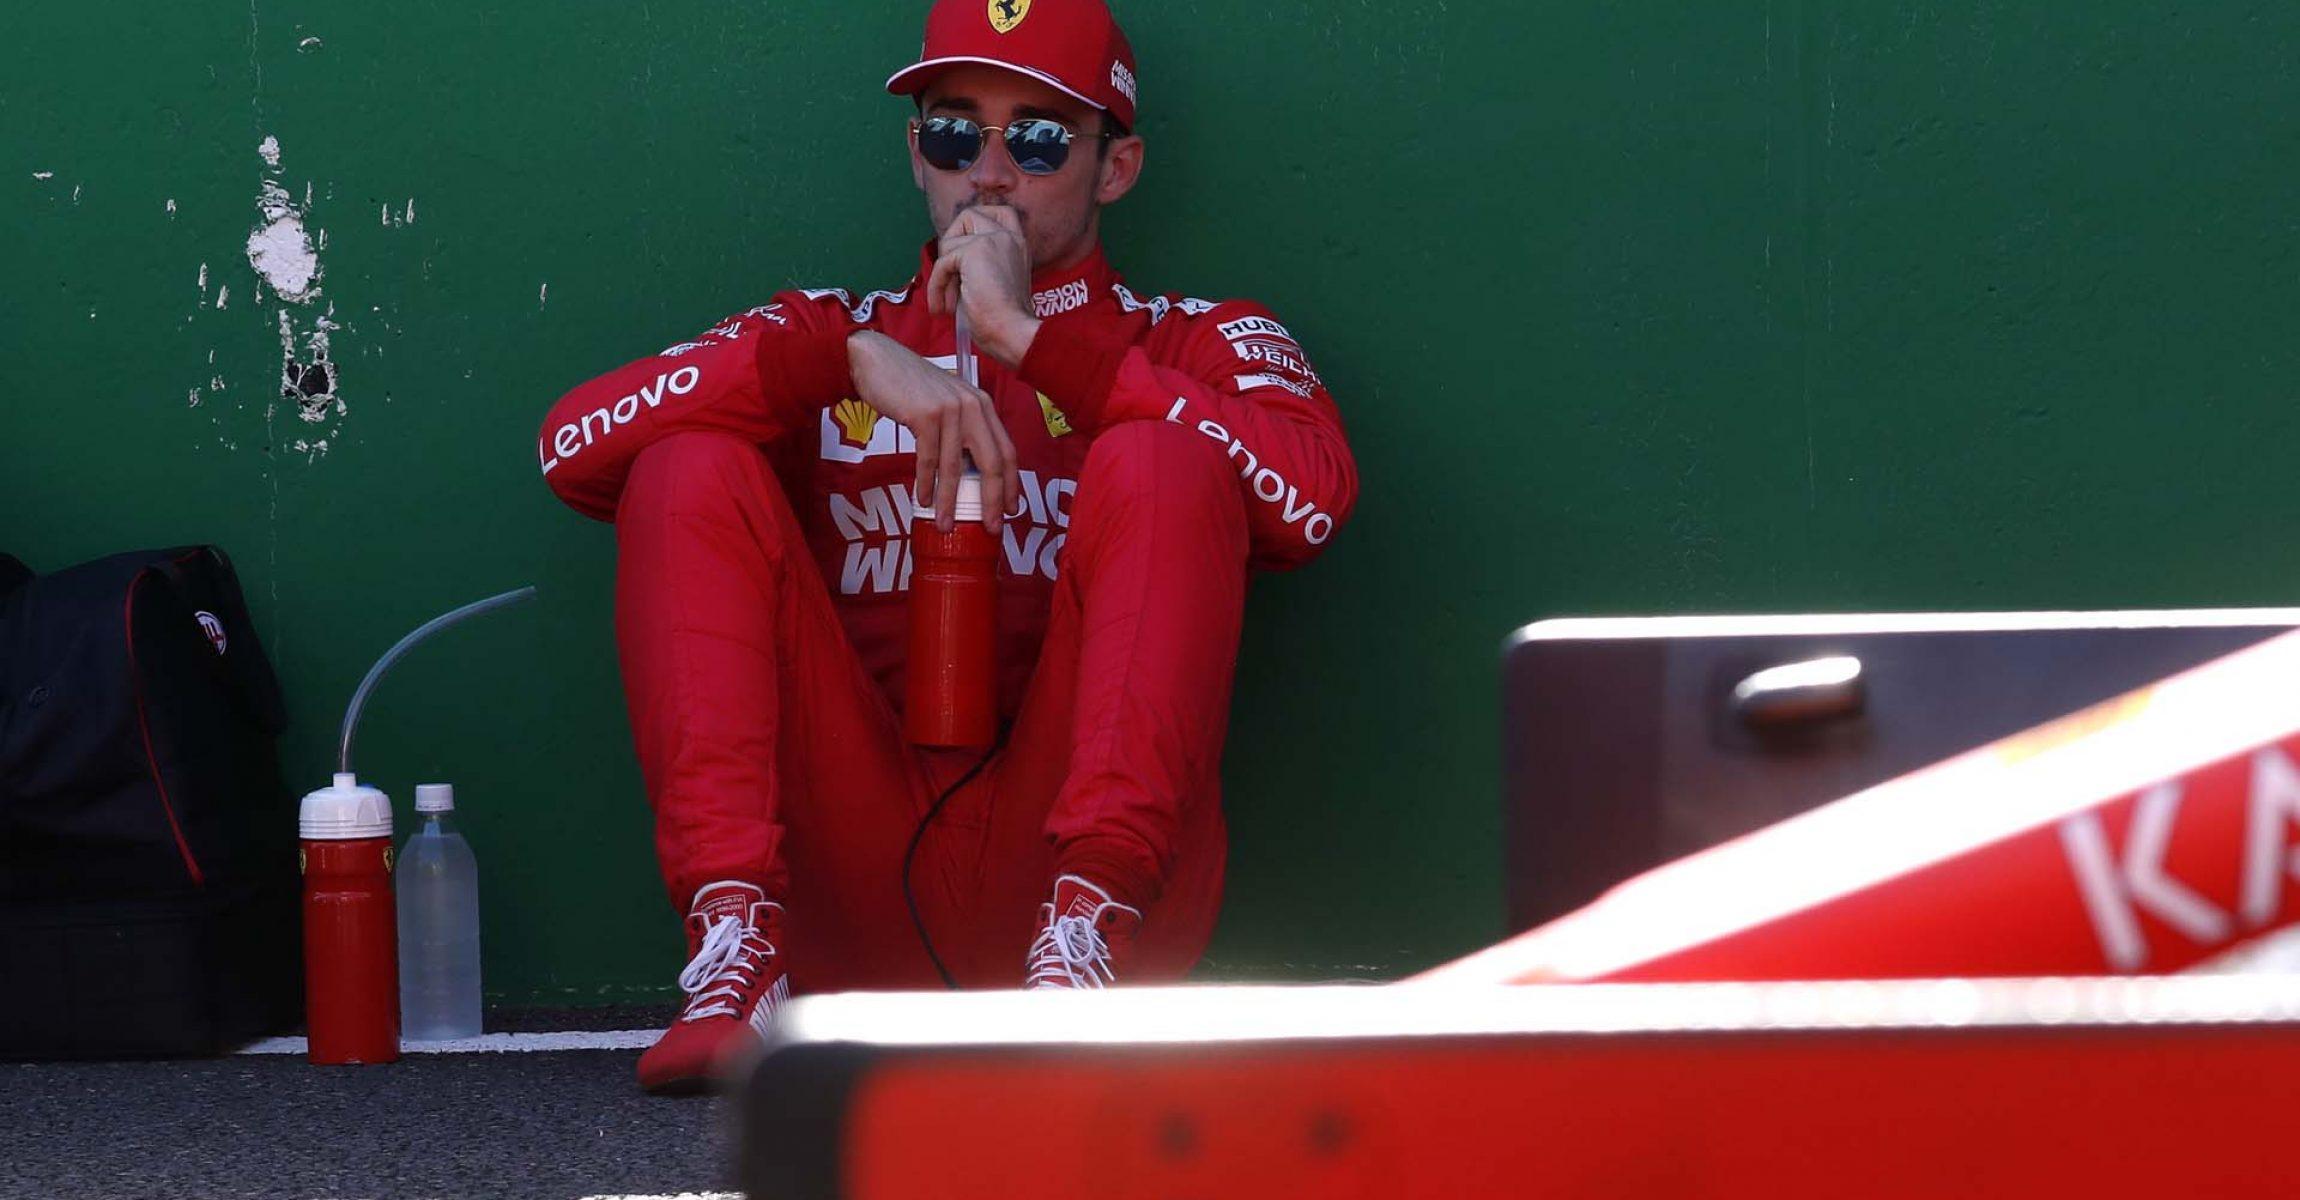 Formula One F1 - Japanese Grand Prix - Suzuka Circuit, Suzuka, Japan - October 13, 2019. Ferrari's Charles Leclerc before the race. REUTERS/Kim Hong-Ji